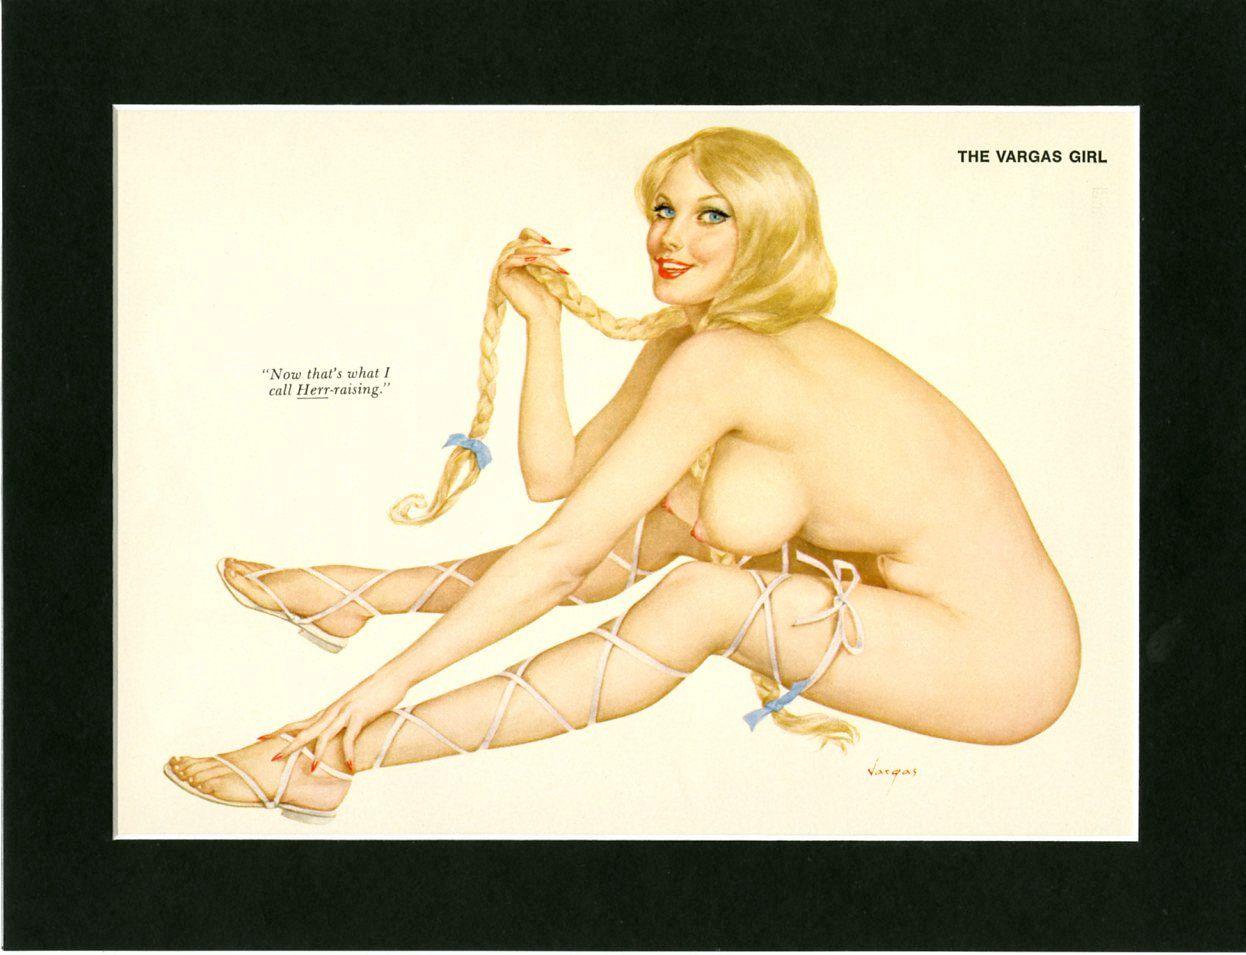 Vargas Girl Pin-Up April 1972 ~ Vintage Playboy Mature Print ~ Magazine Illustration ~ Nude Pinup Girl ~ Magazine Art ~ Paper Ephemera by VintageAdWorld on Etsy